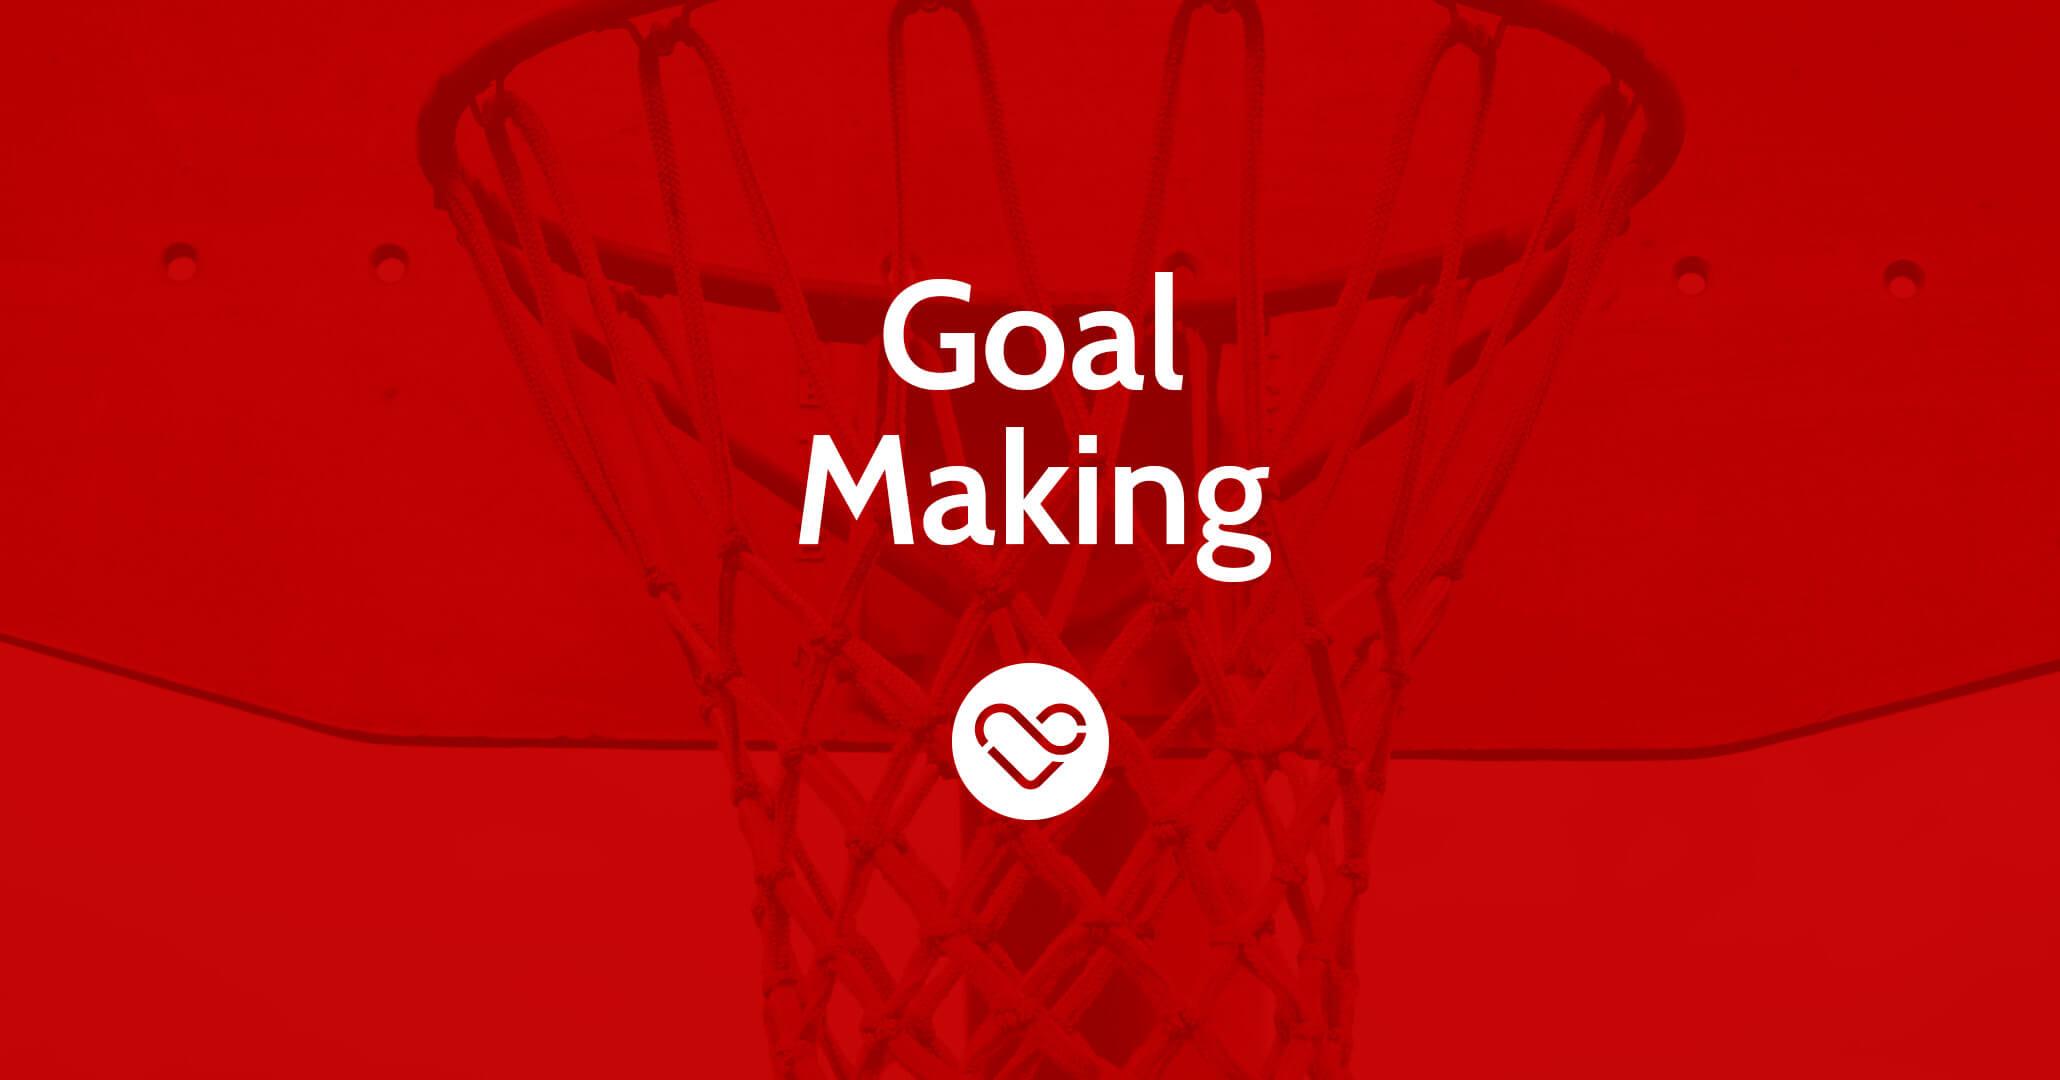 Goal Making